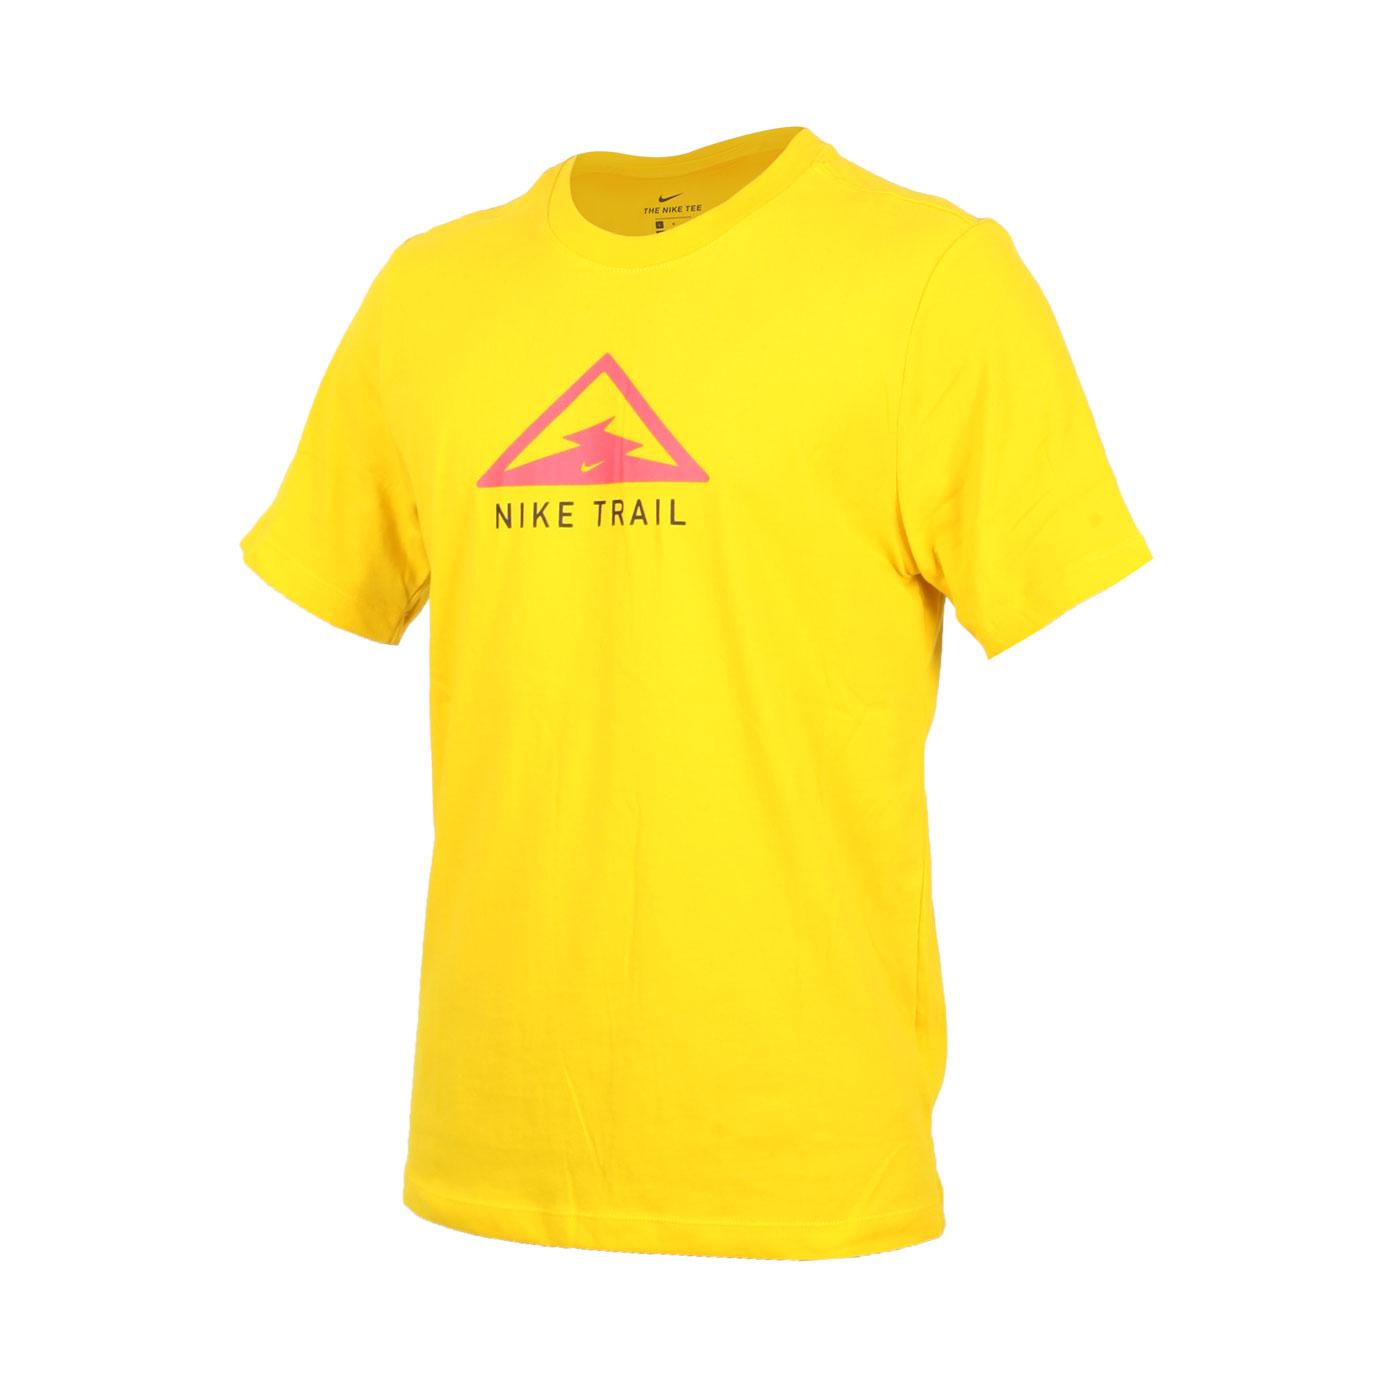 NIKE 男款越野跑步短袖T恤 CT3858-010 - 黃桃紅黑